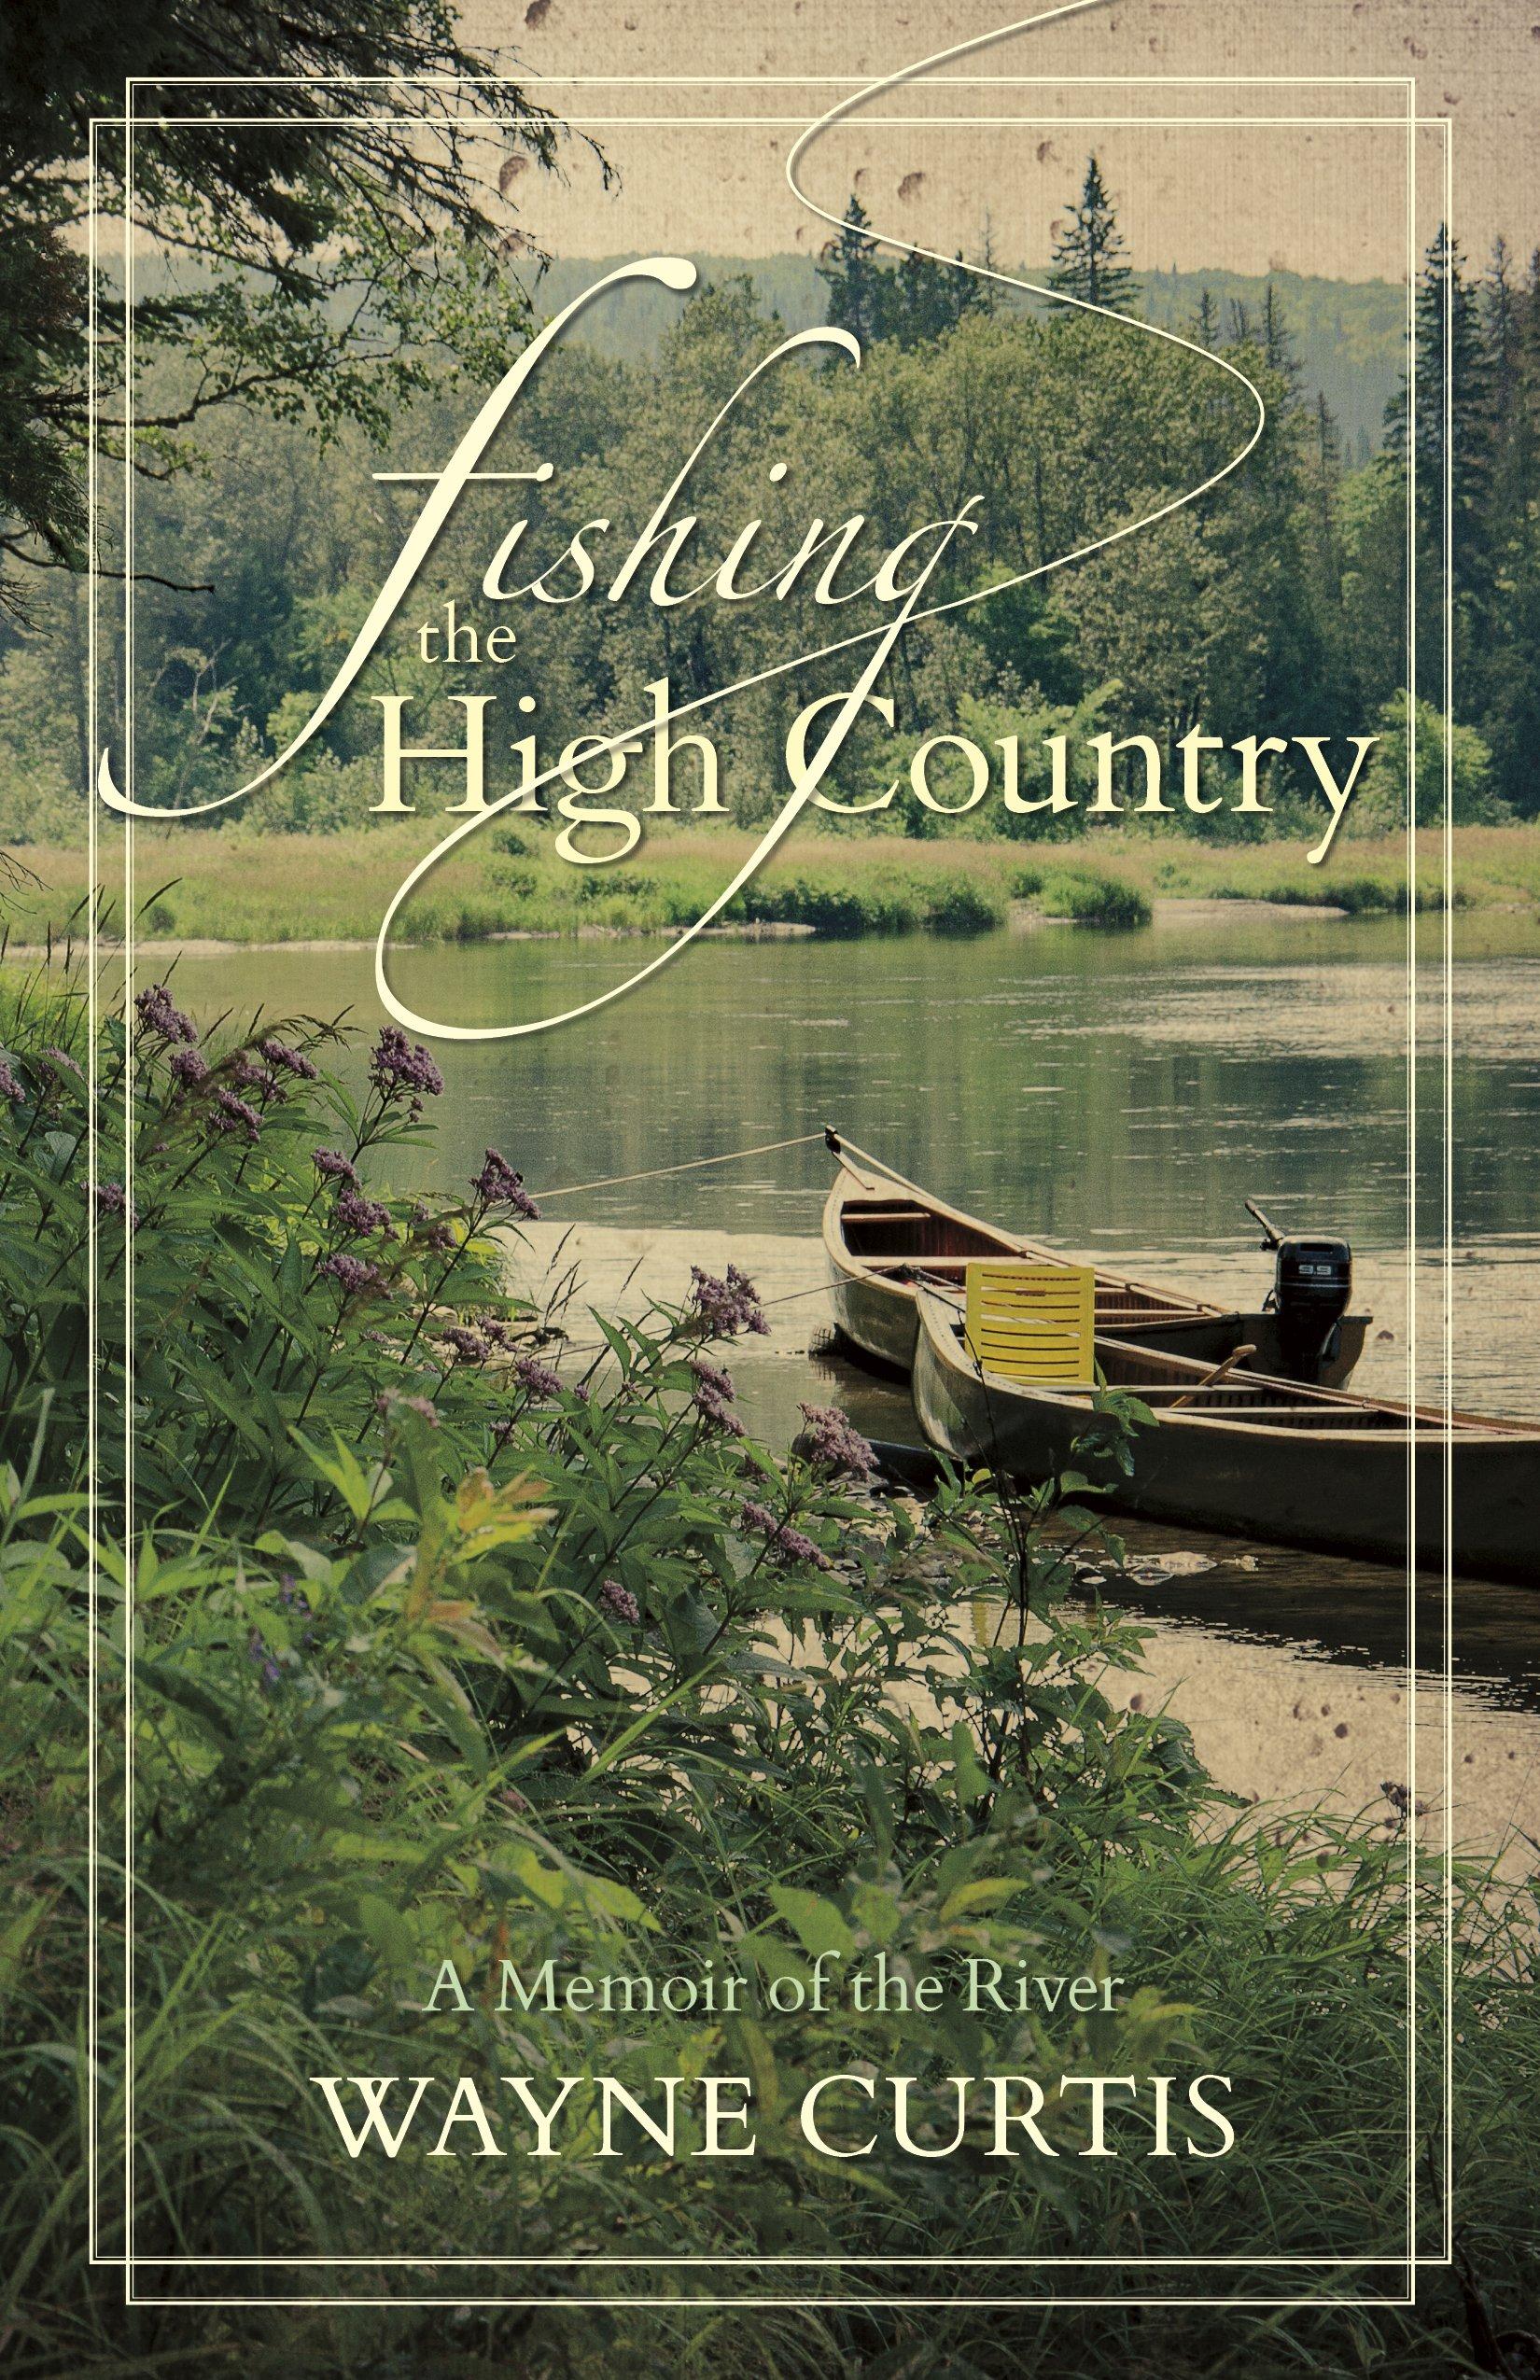 Fishing the High Country: A Memoir of the River pdf epub